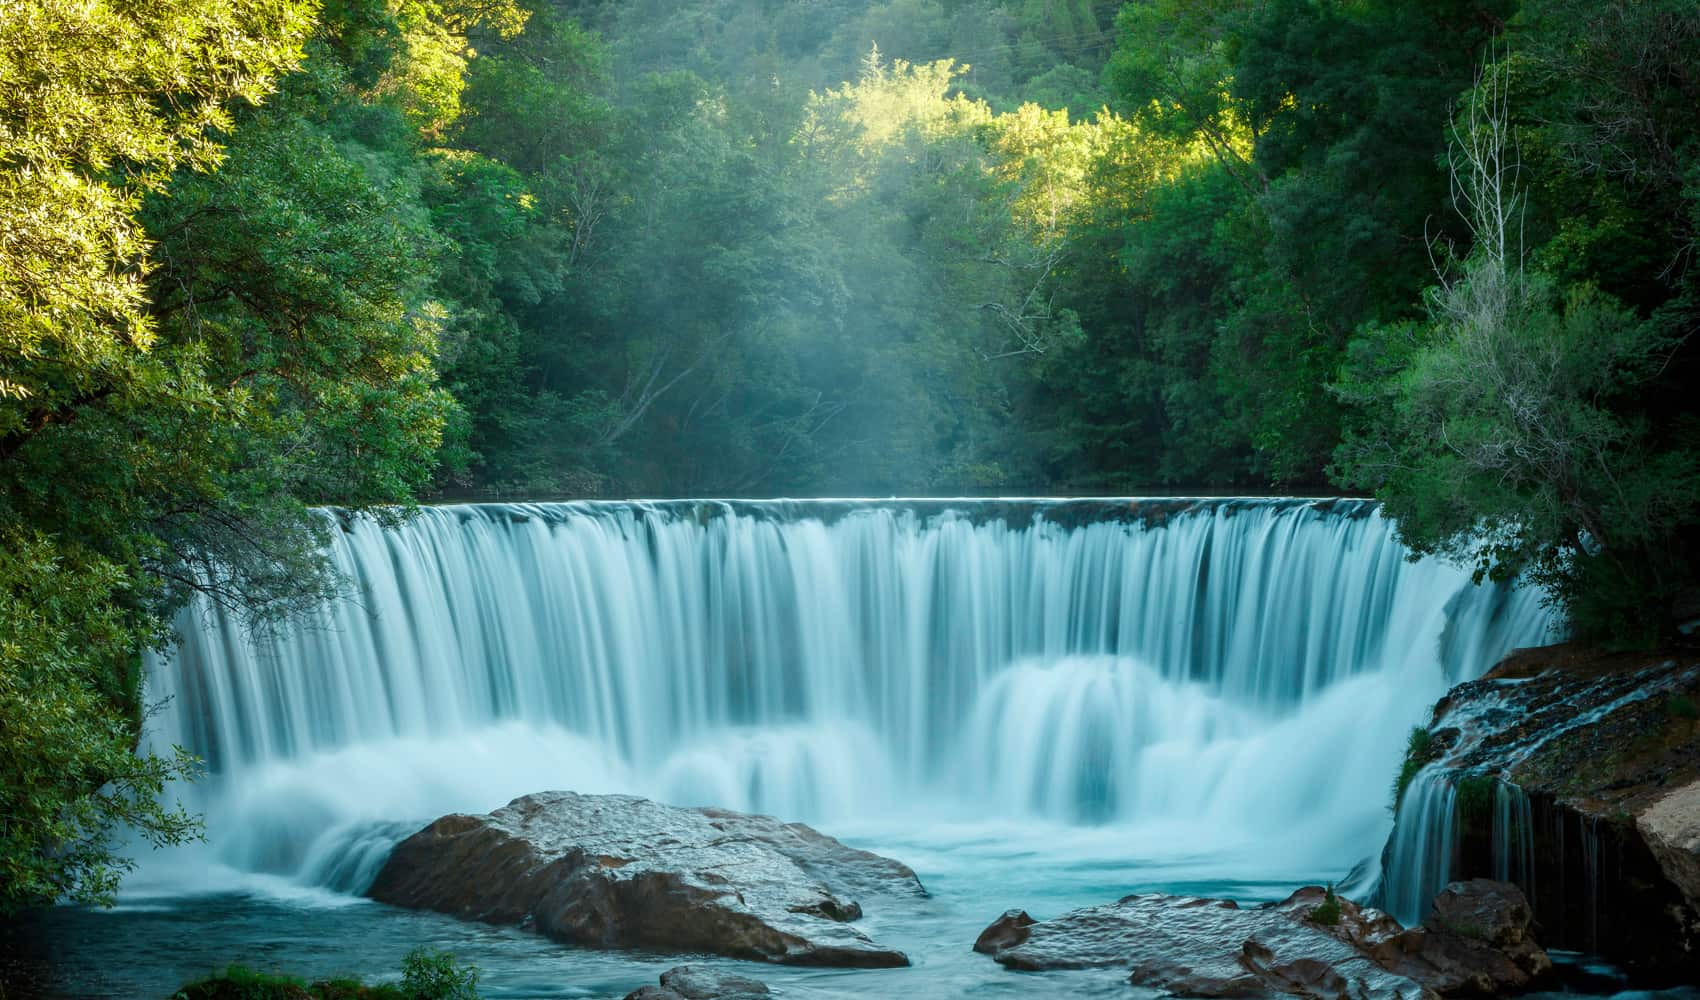 WATER AND AQUATIC